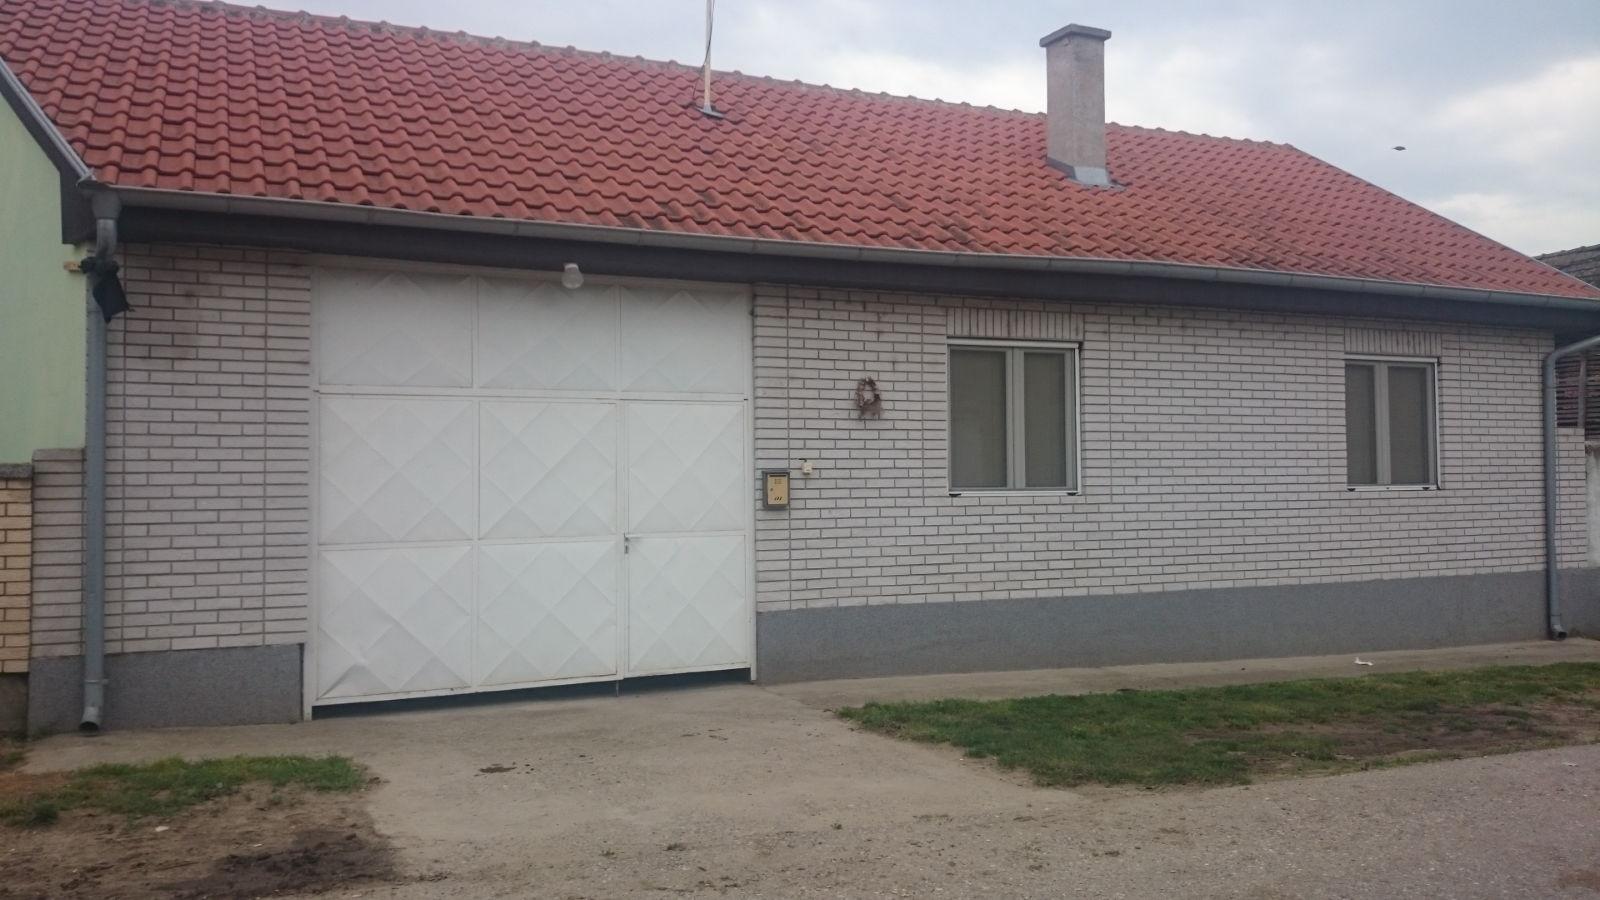 zu verkaufen haus dubovac smederevo serbien dubovac. Black Bedroom Furniture Sets. Home Design Ideas